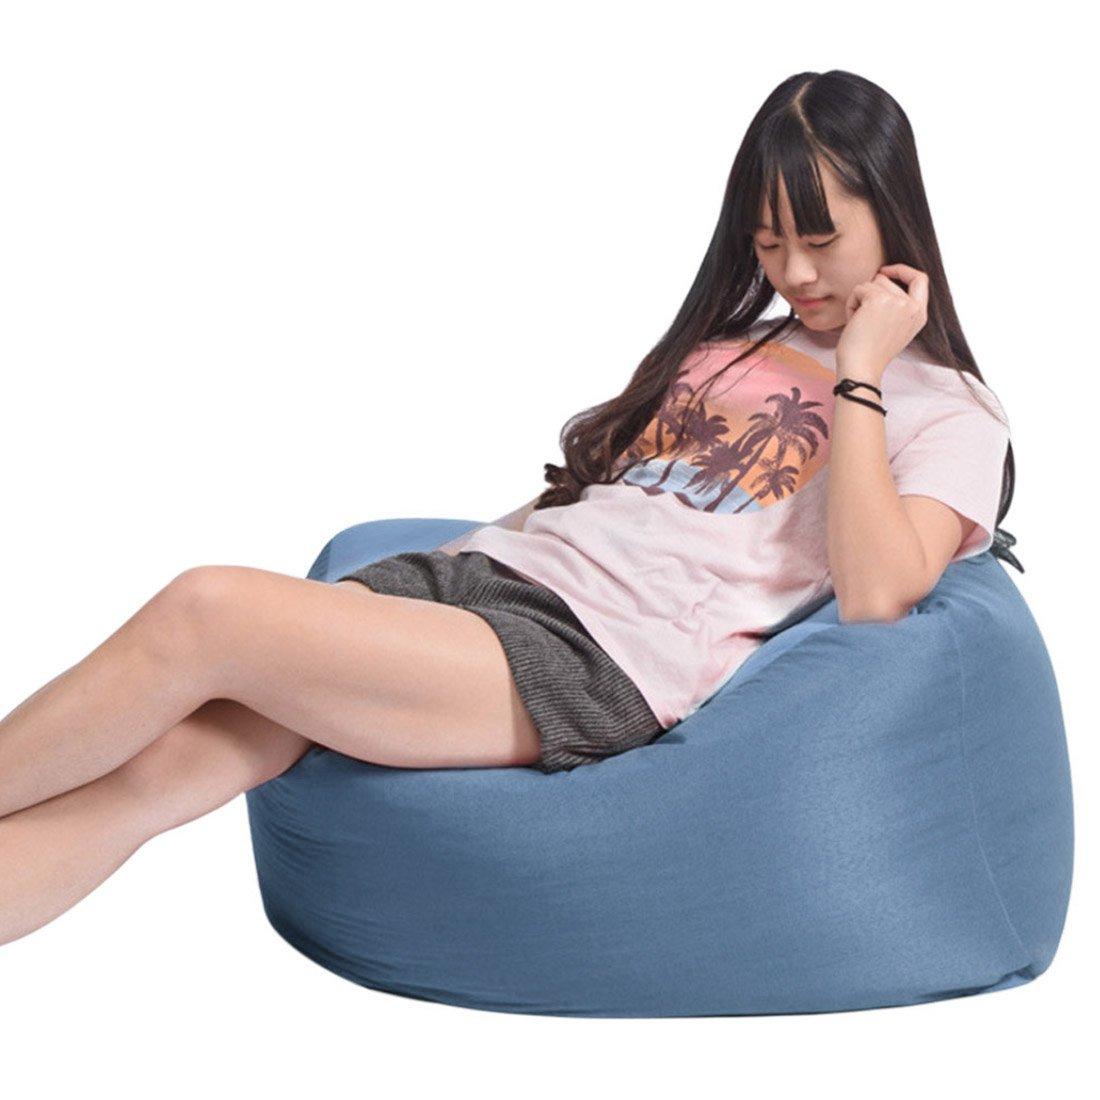 Jiyaru Bean Bag Chair Adults Kids Lazy Sofa Gaming Chair Indoor Outdoor Beanbag Blue